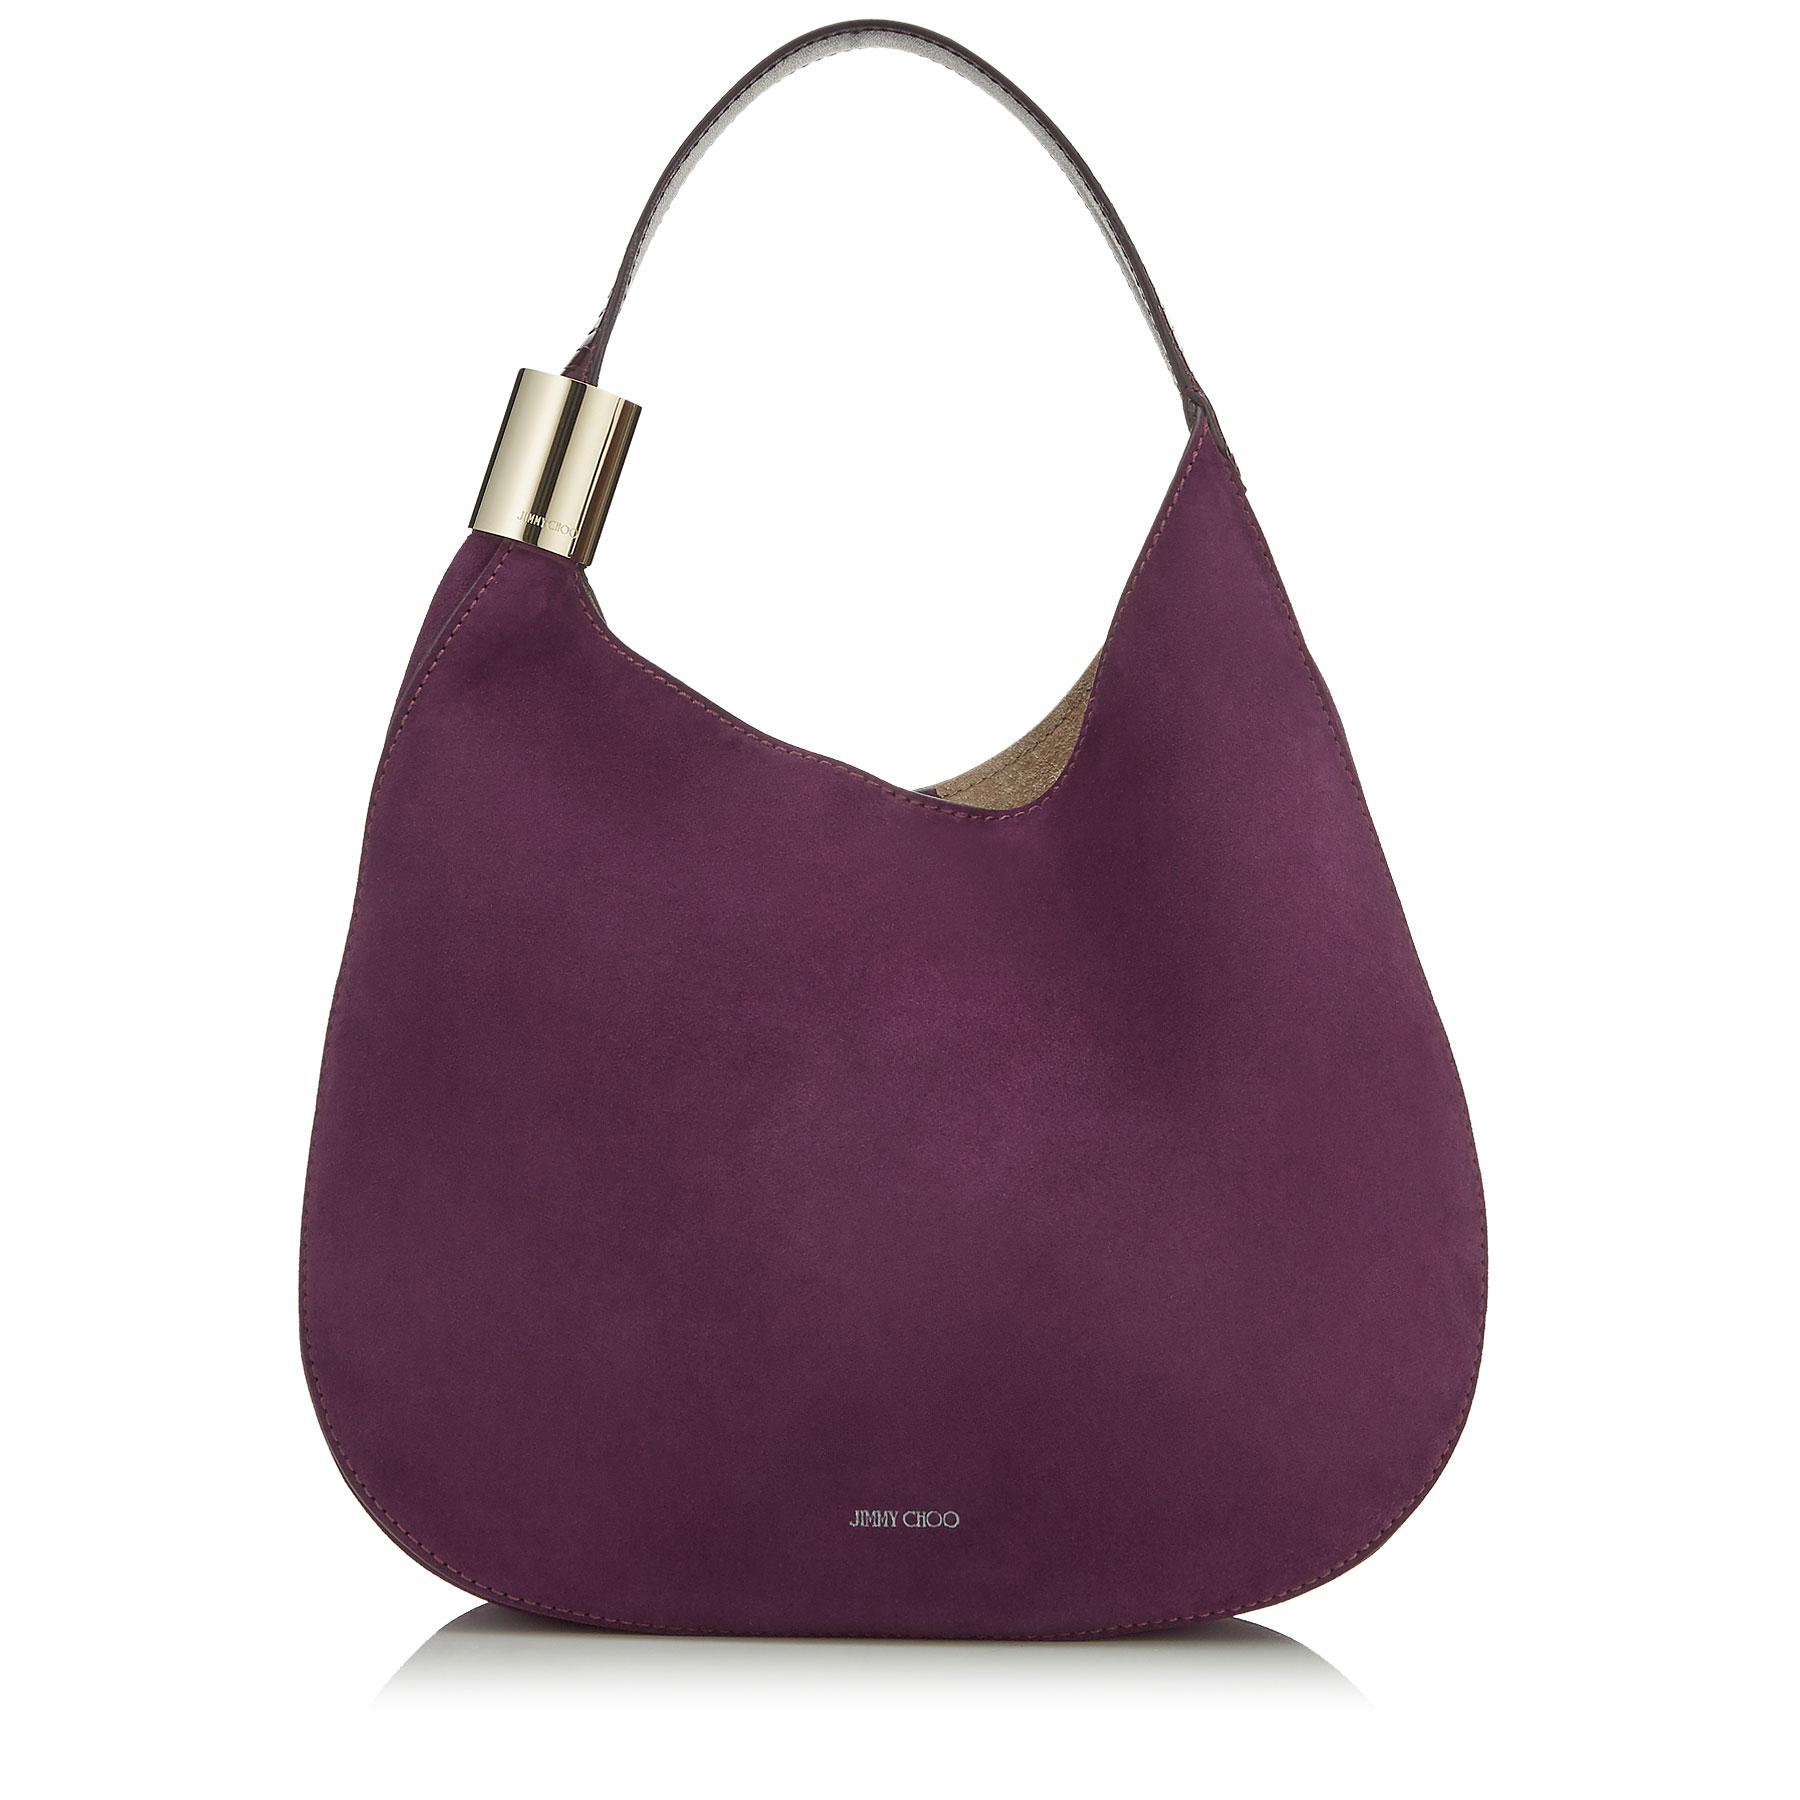 1c2b7647afa3 Jimmy Choo Stevie Grape Suede And Elaphe Shoulder Bag In Pink   Purple